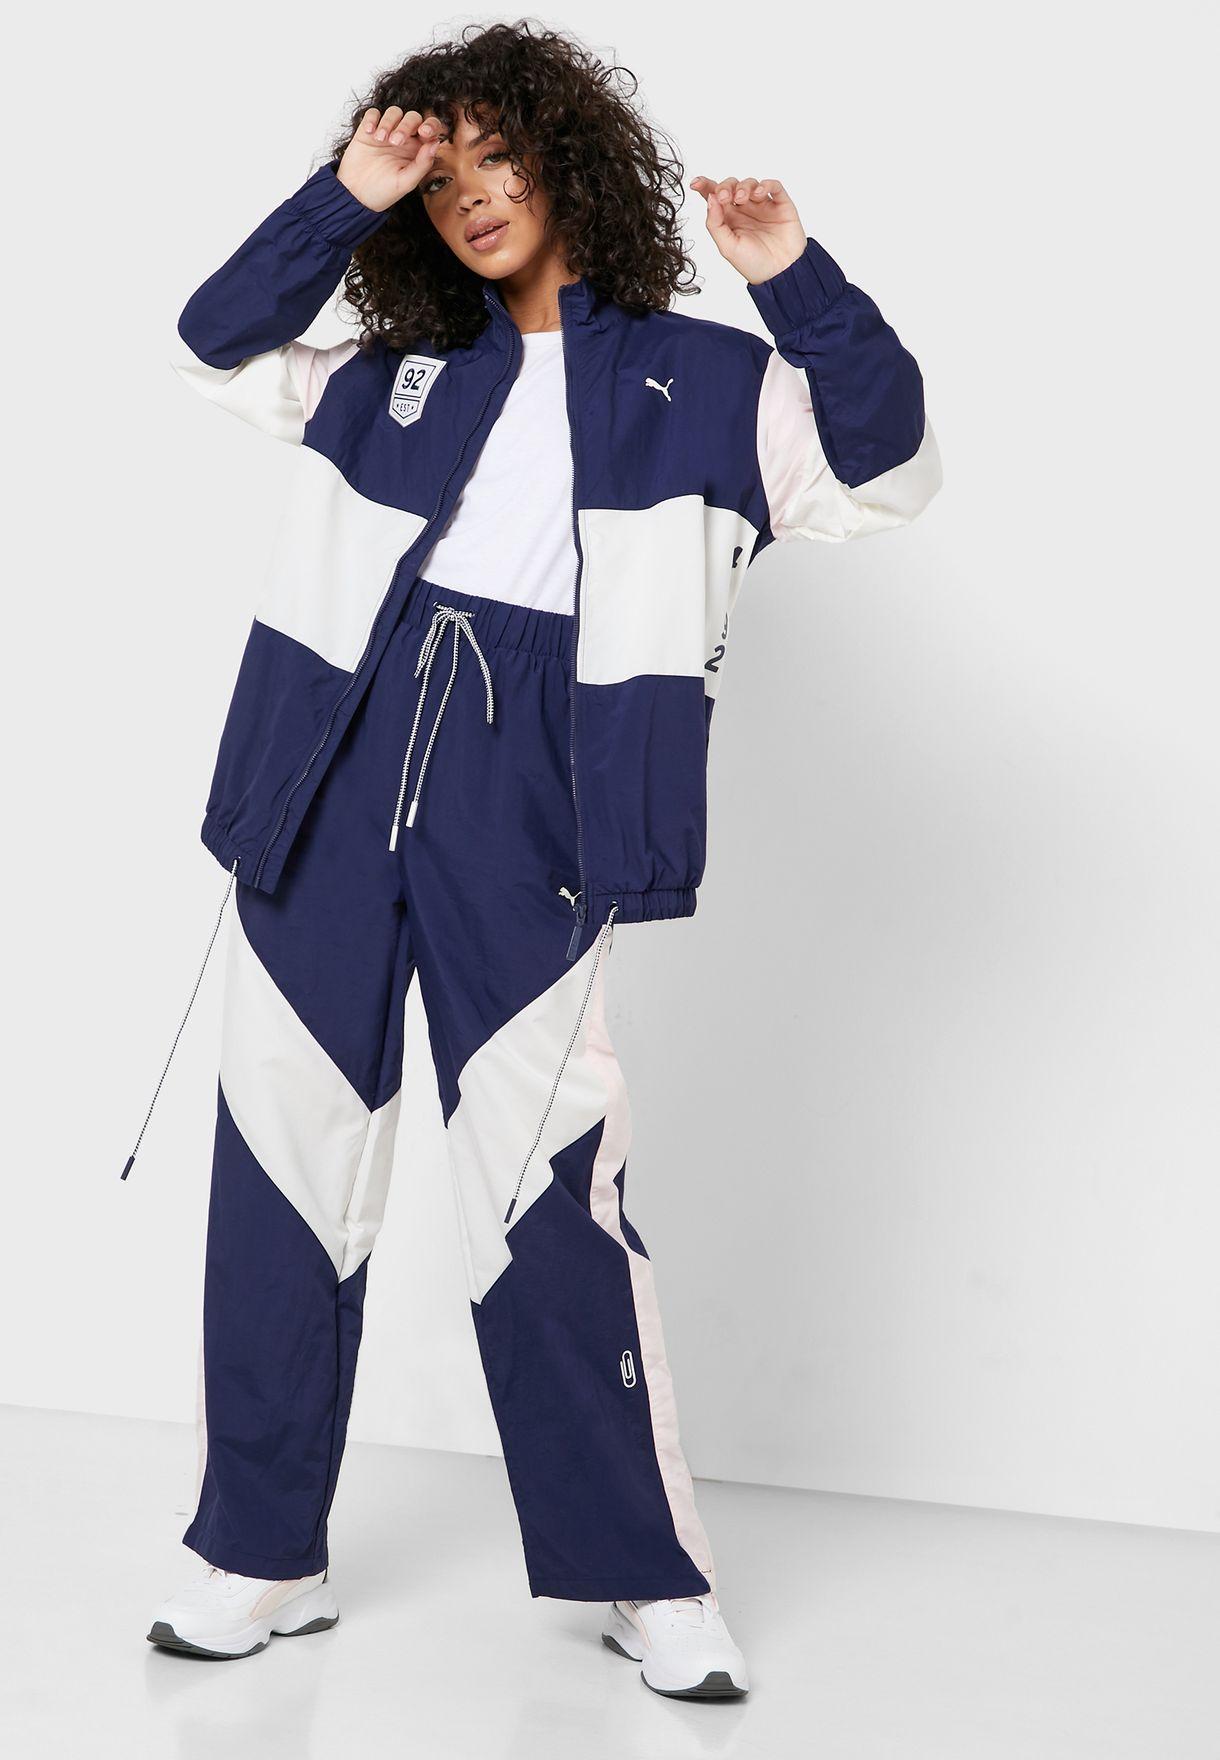 Selena Gomez Colour Block Jacket